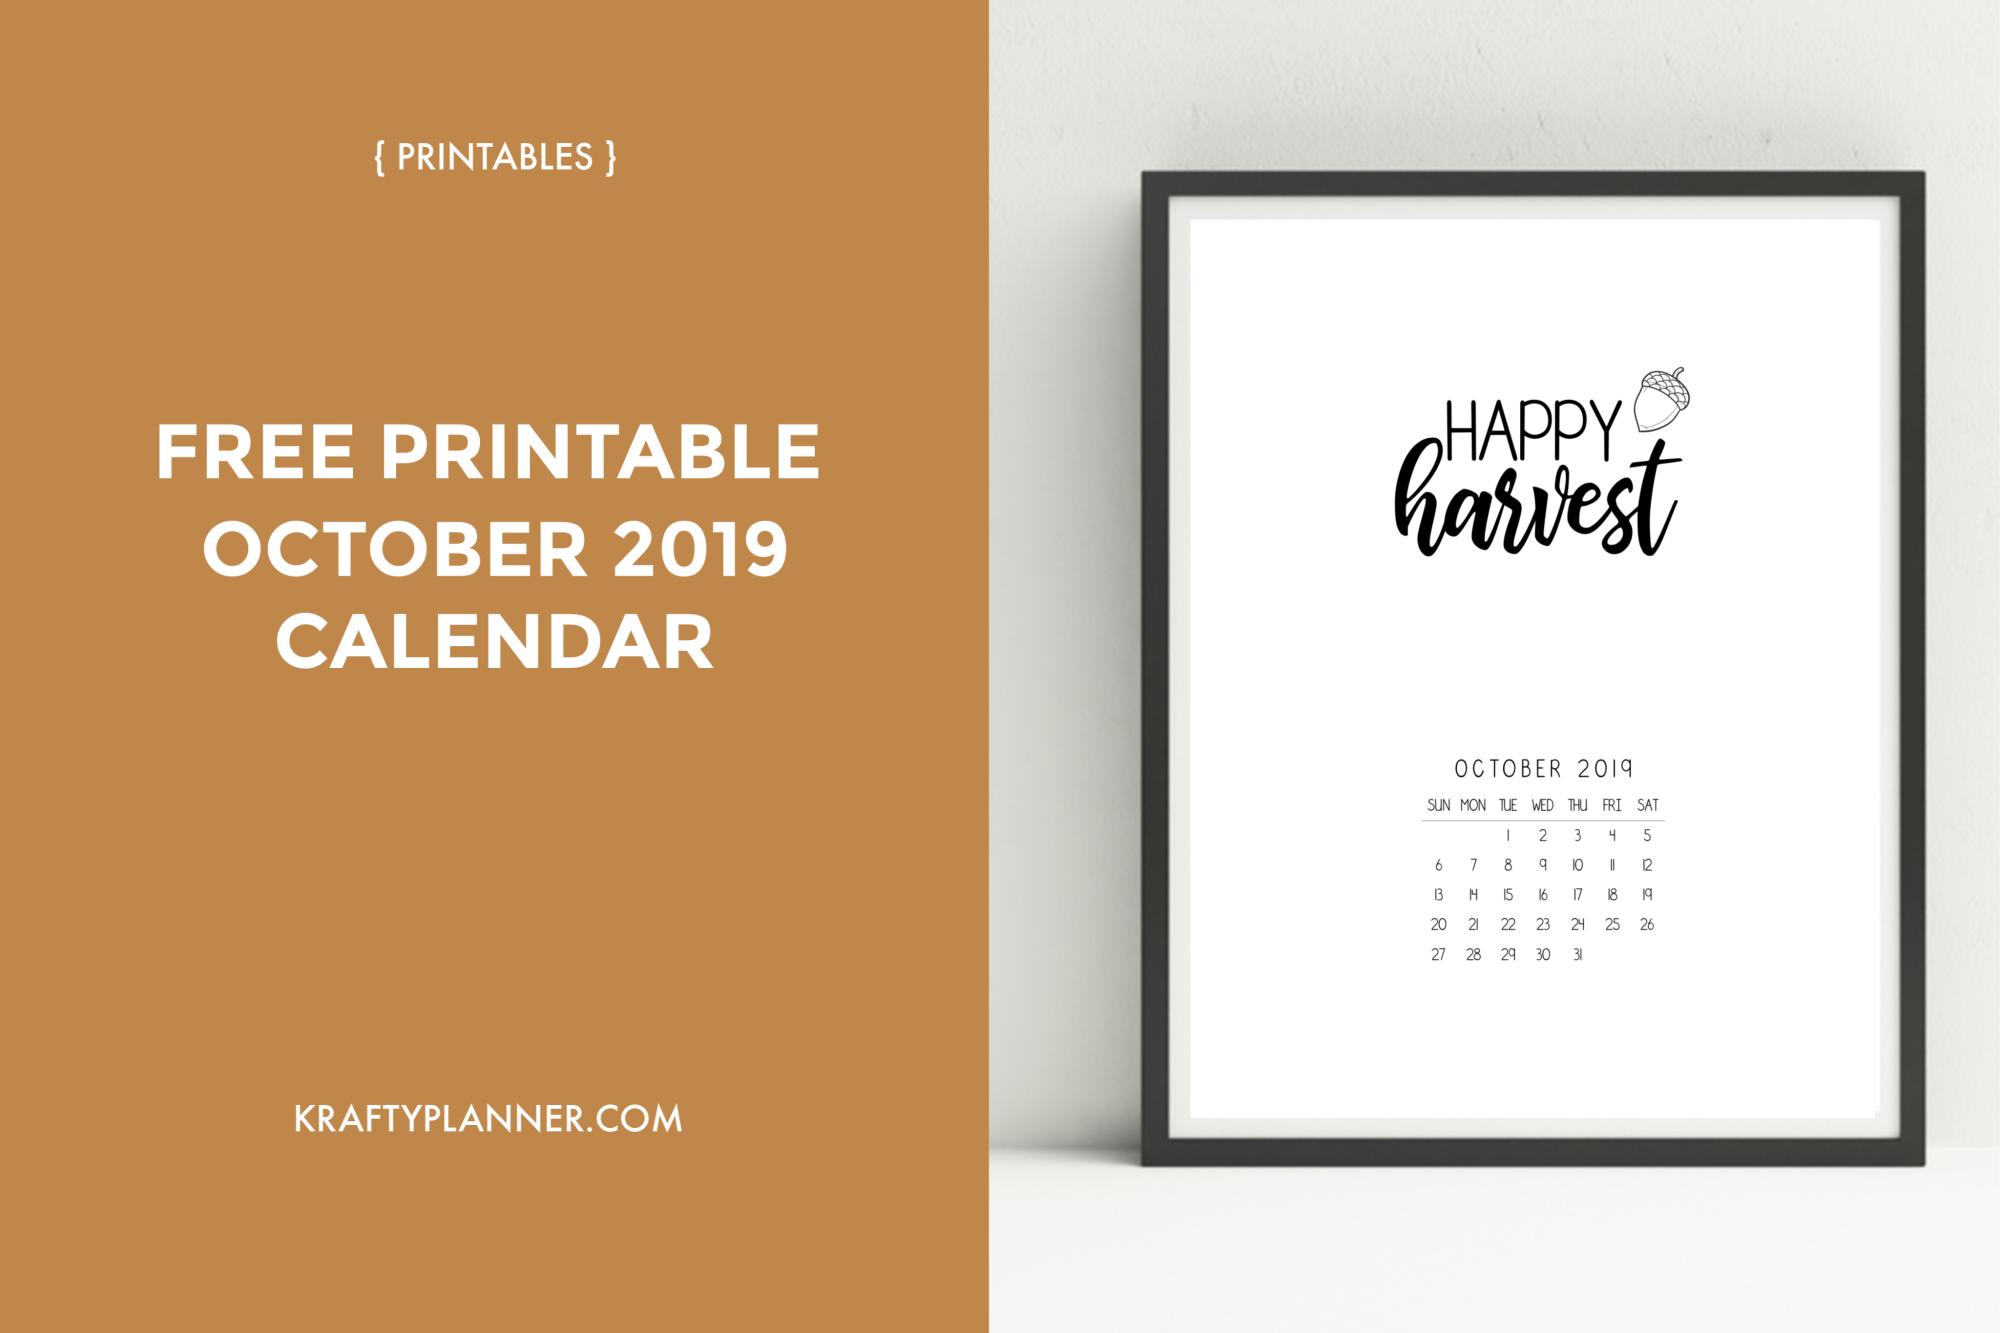 Free Printable October Calendar.png